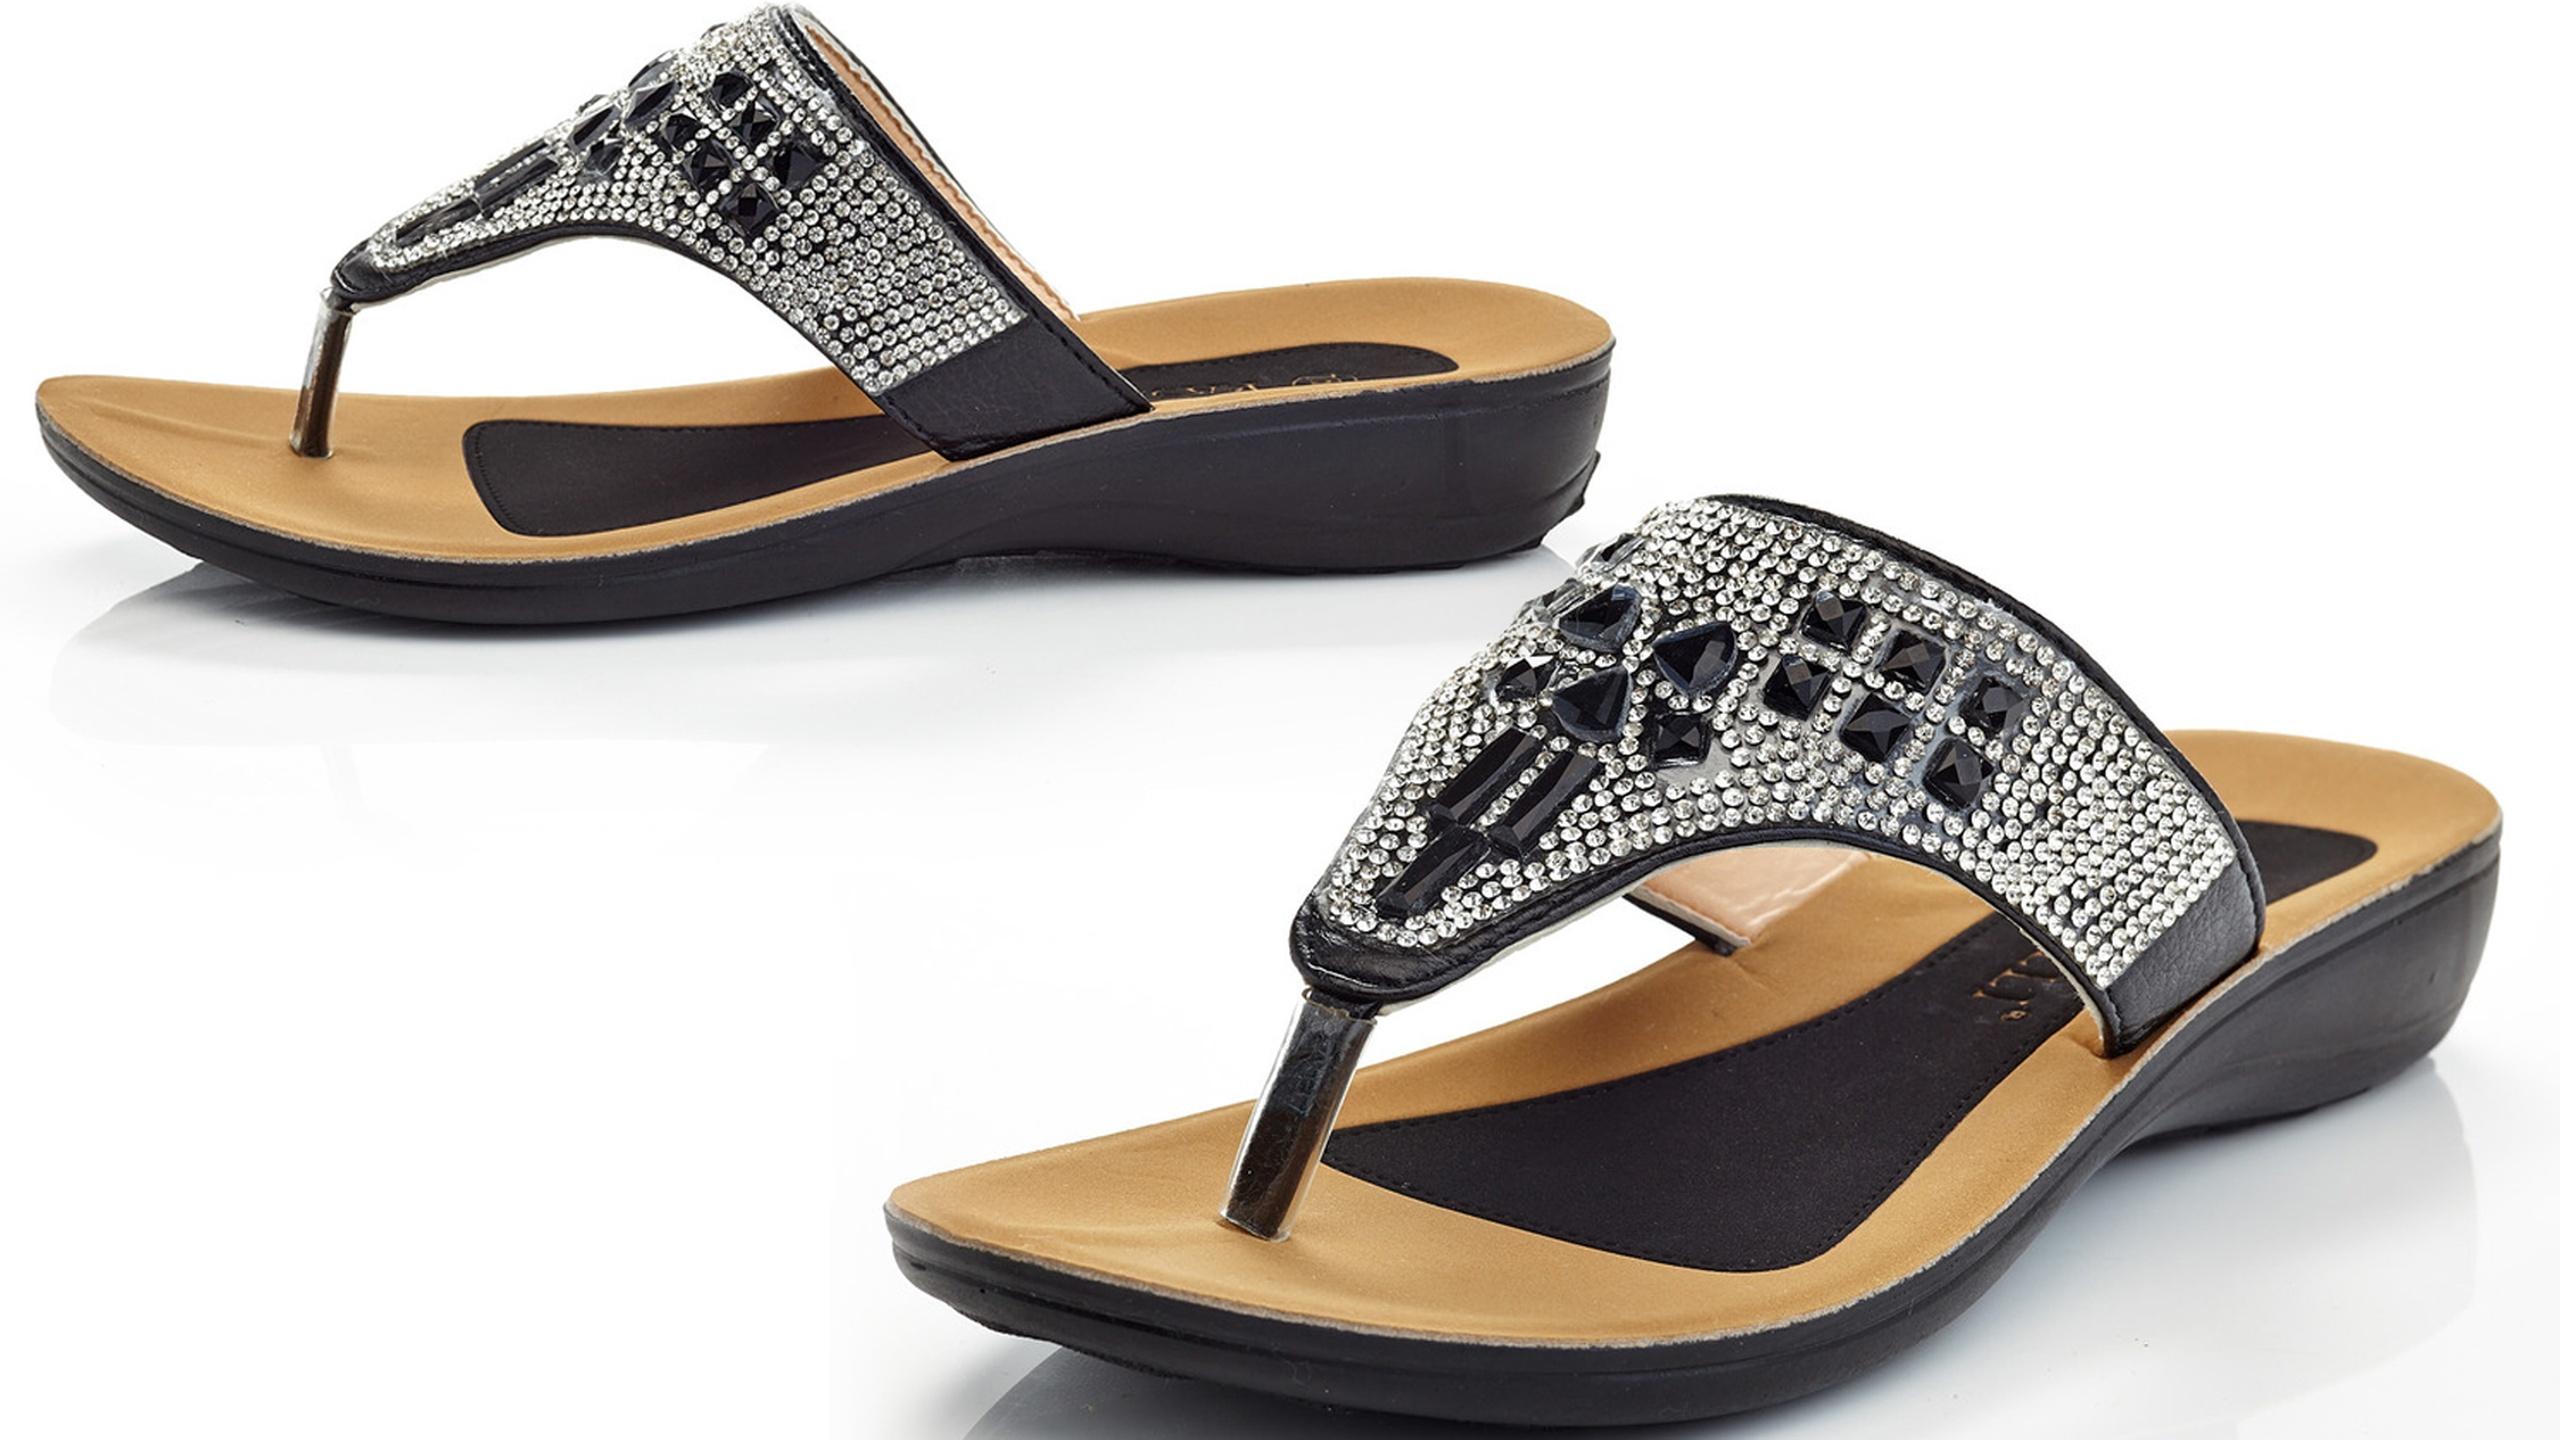 909fd230d573 Rasolli Women s Thong Sandal